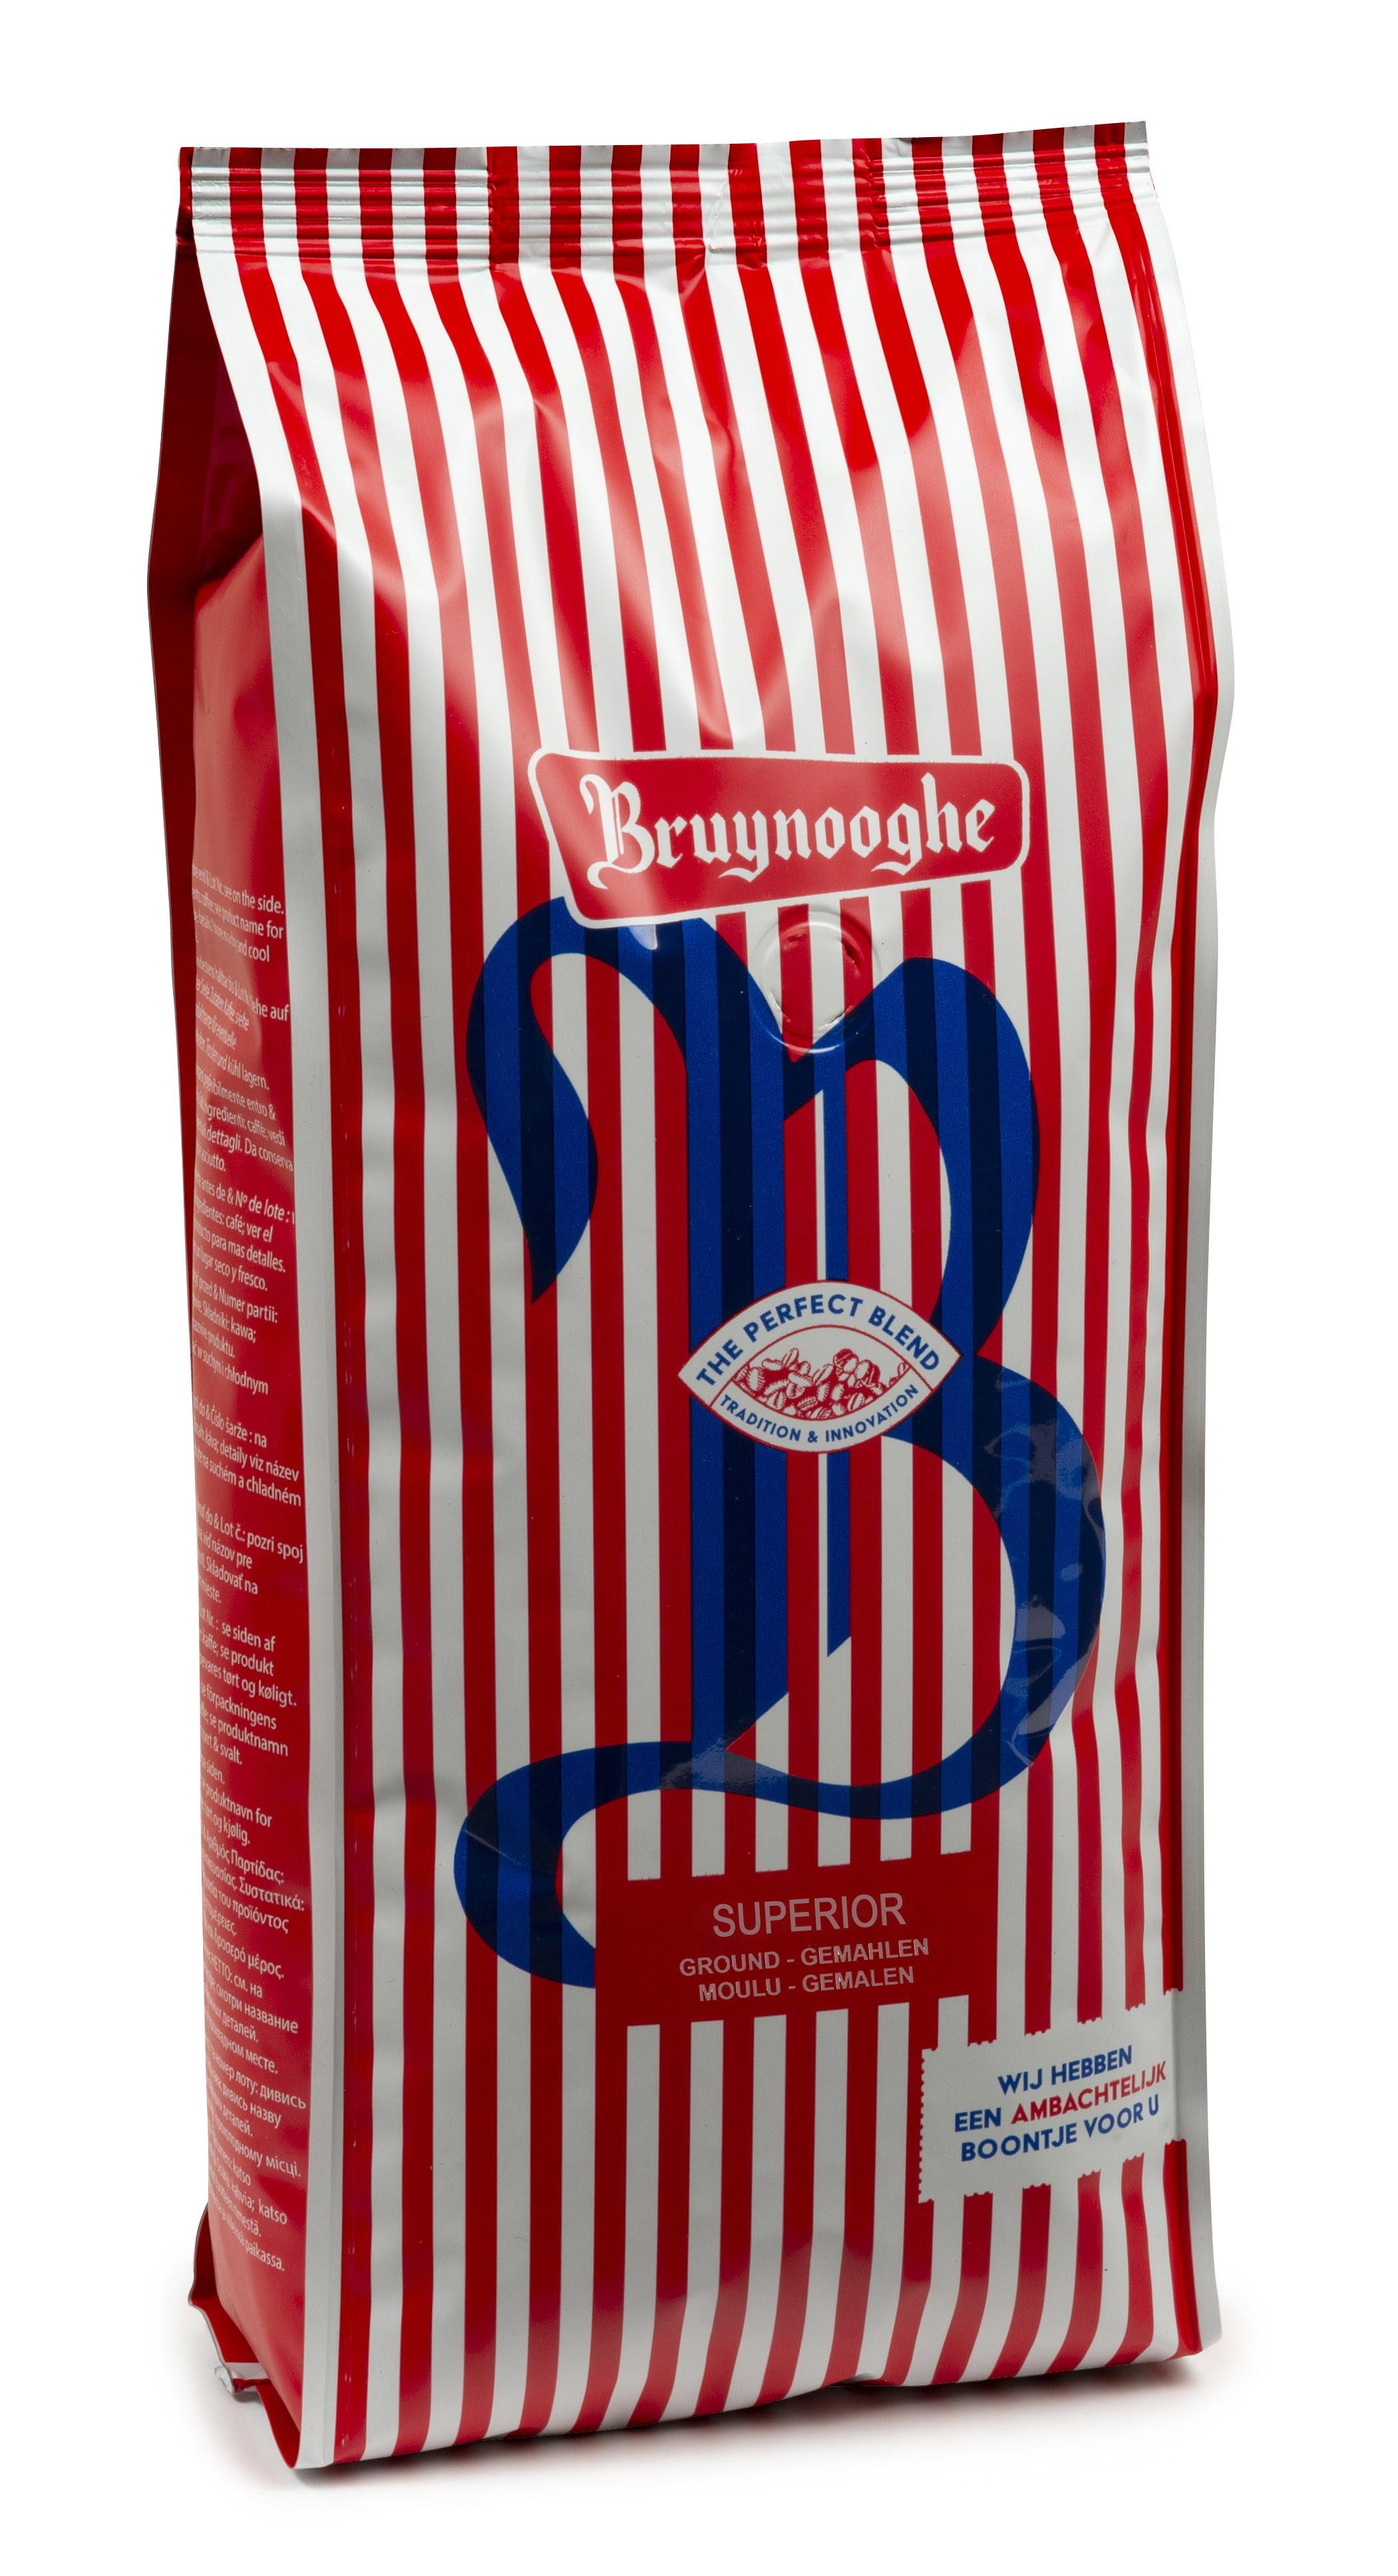 Café Bruynooghe Superior moulu 1kg (Koffie)